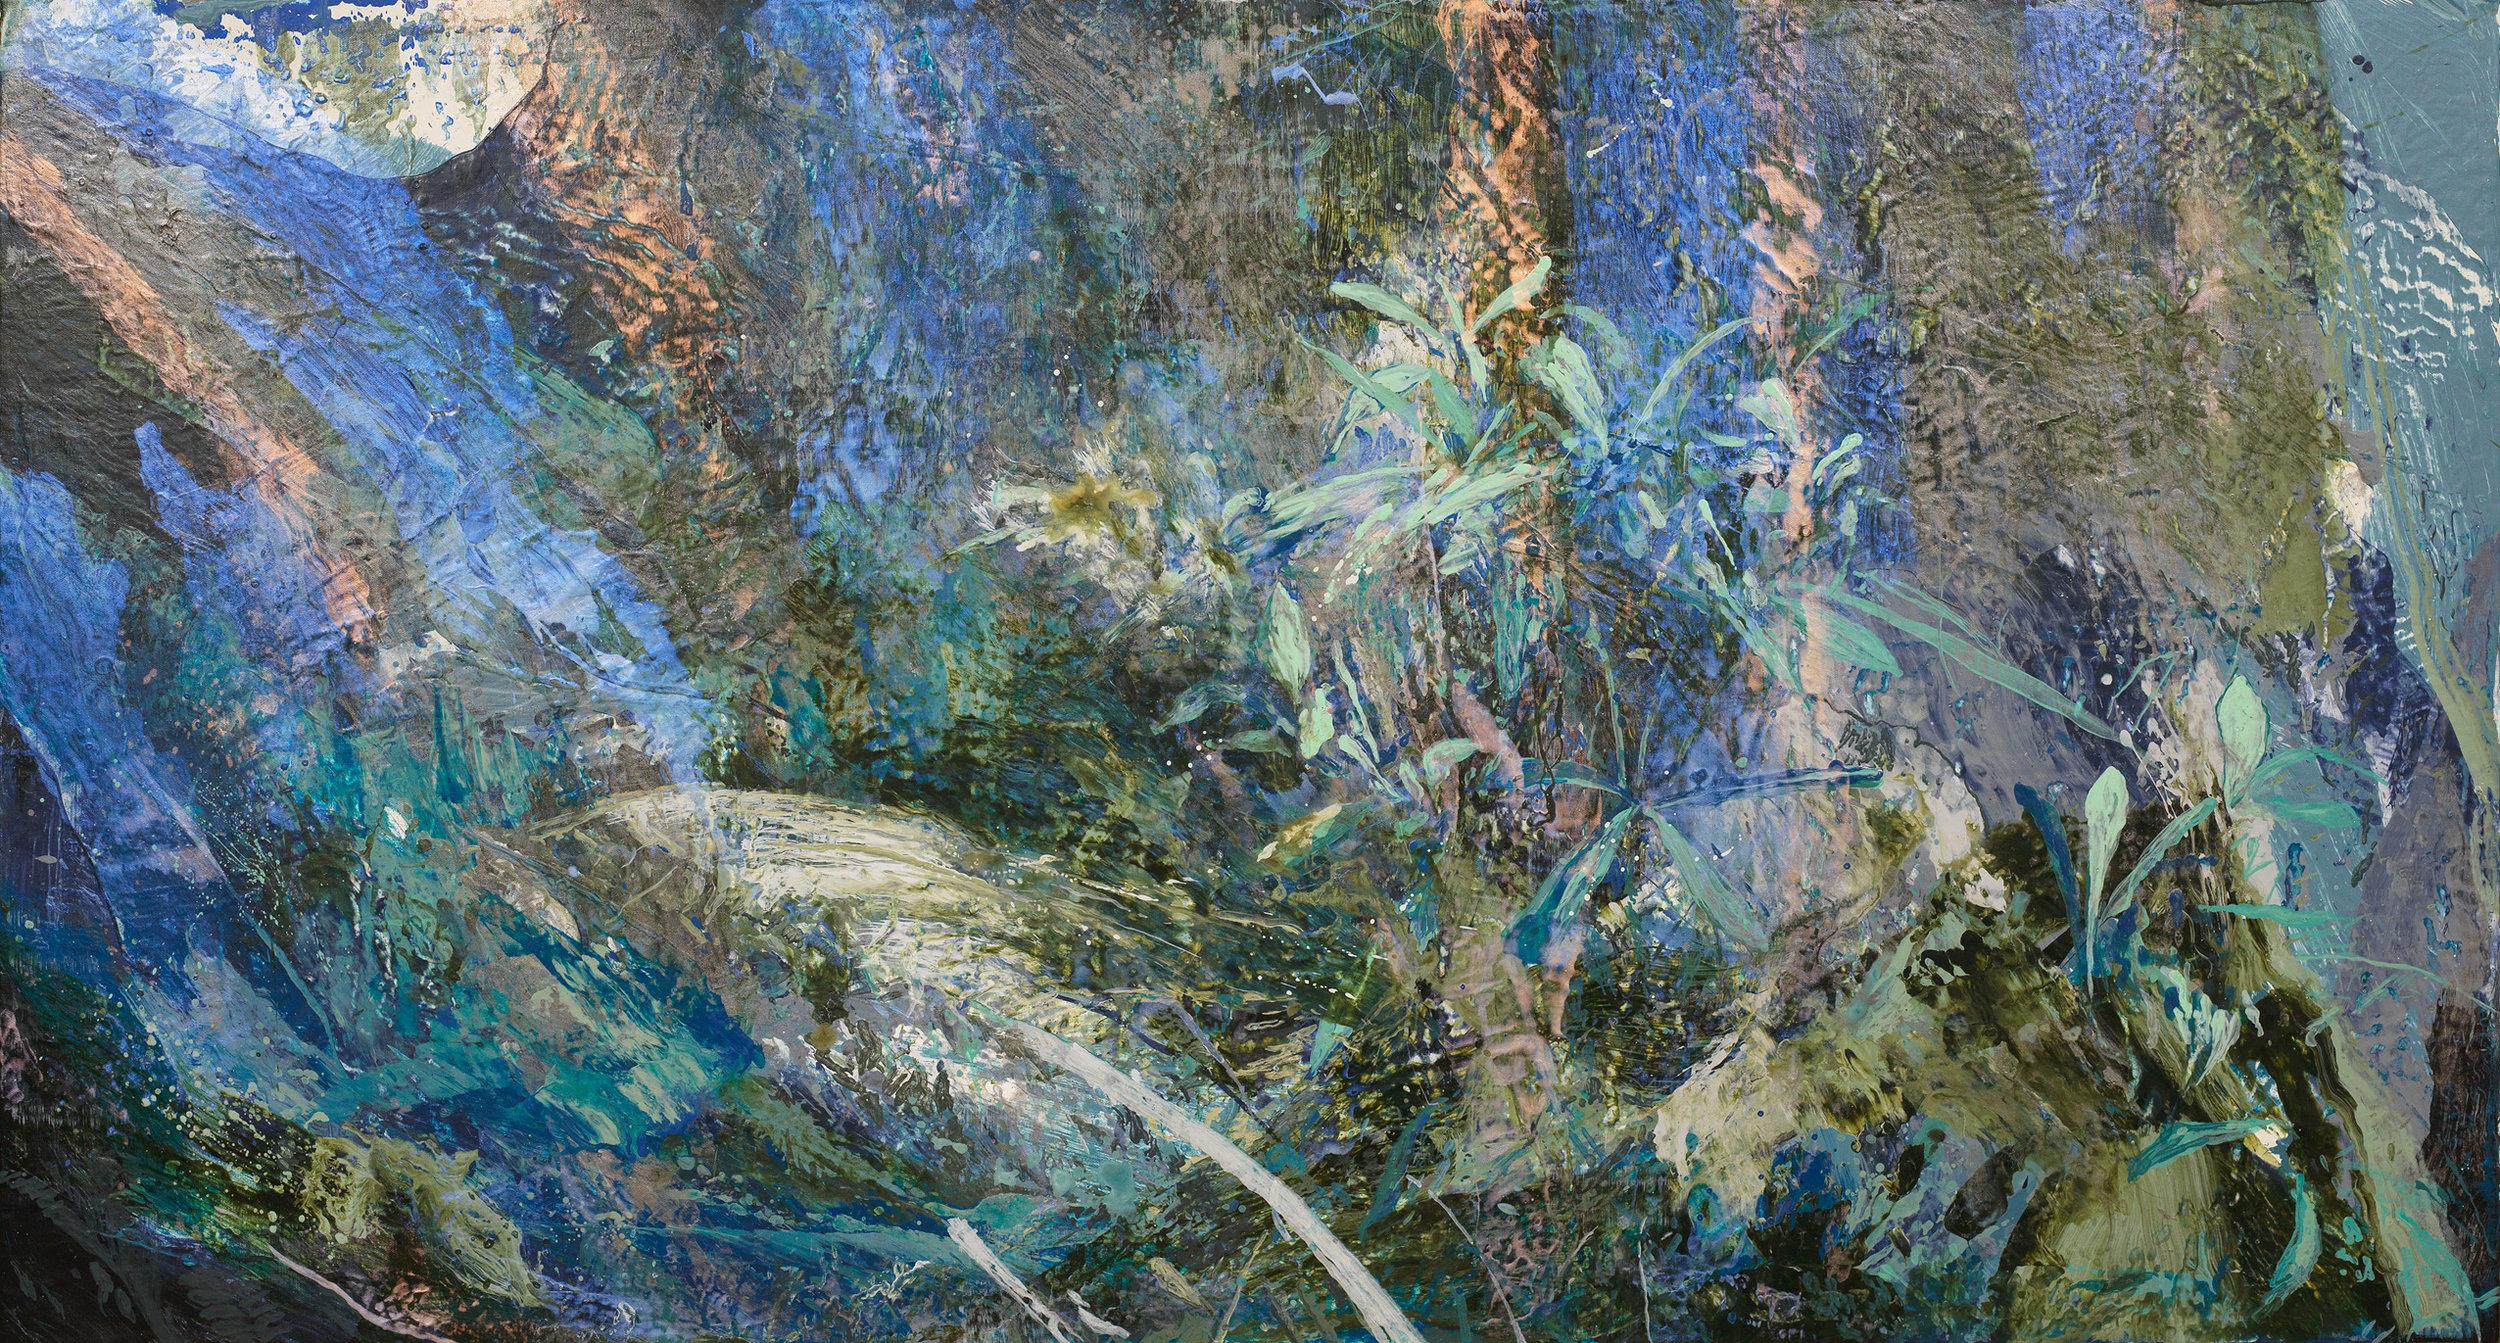 Forest #9 | 森林#9, 2016, Acrylic on Canvas, 80 x 150 cm, SHIU Sheng Hung | 許聖泓 , Image 2/2